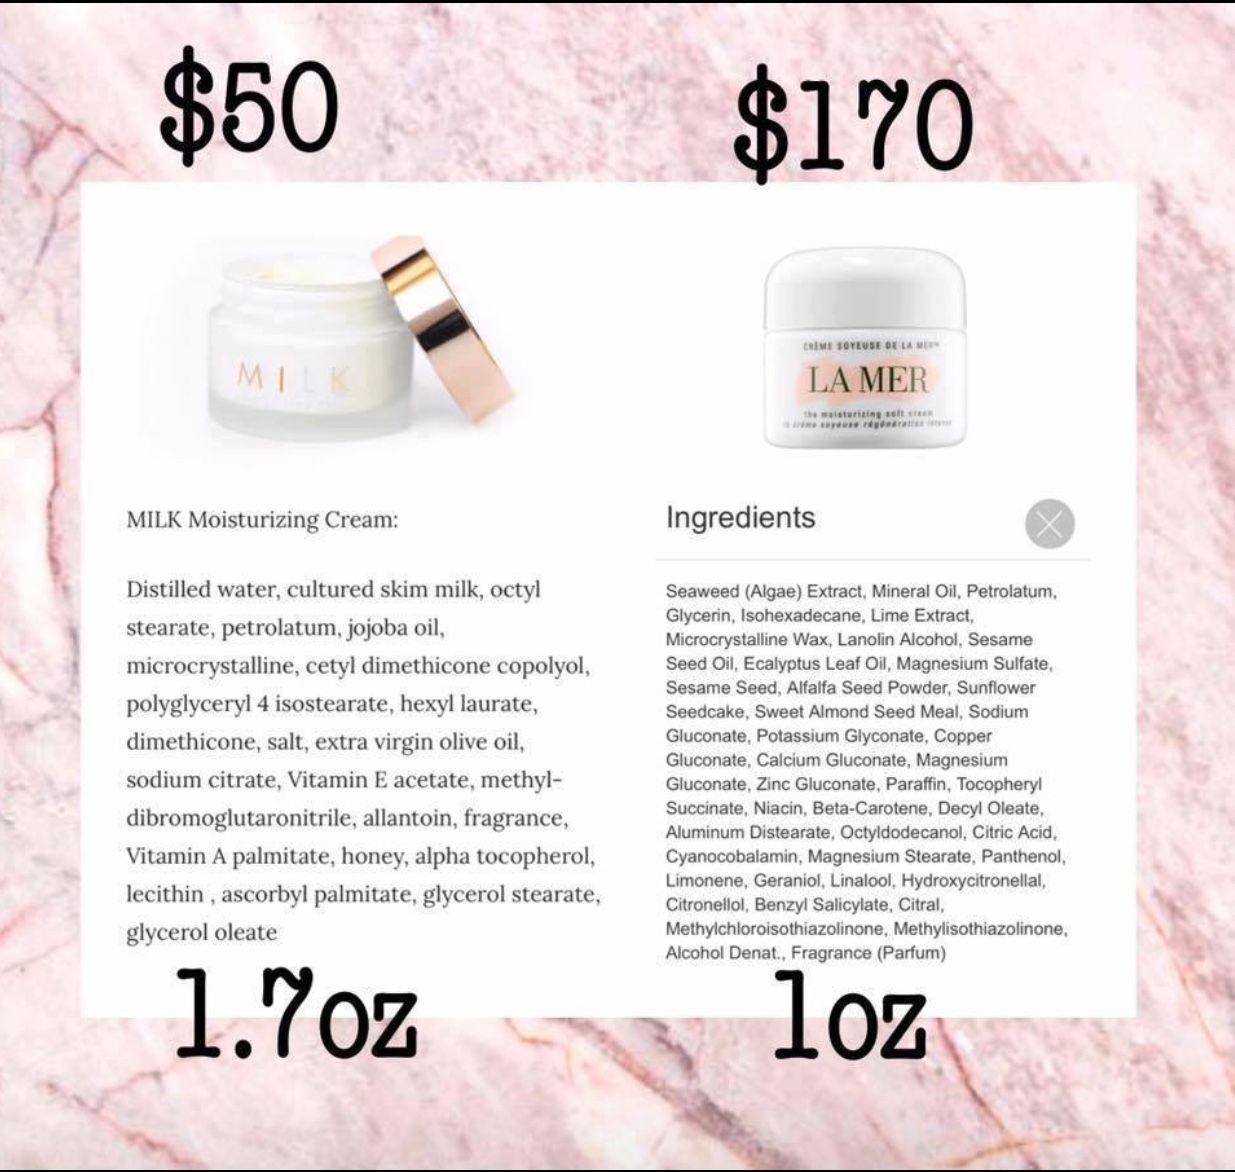 Compare Milk vs another leading brand Moisturizer cream